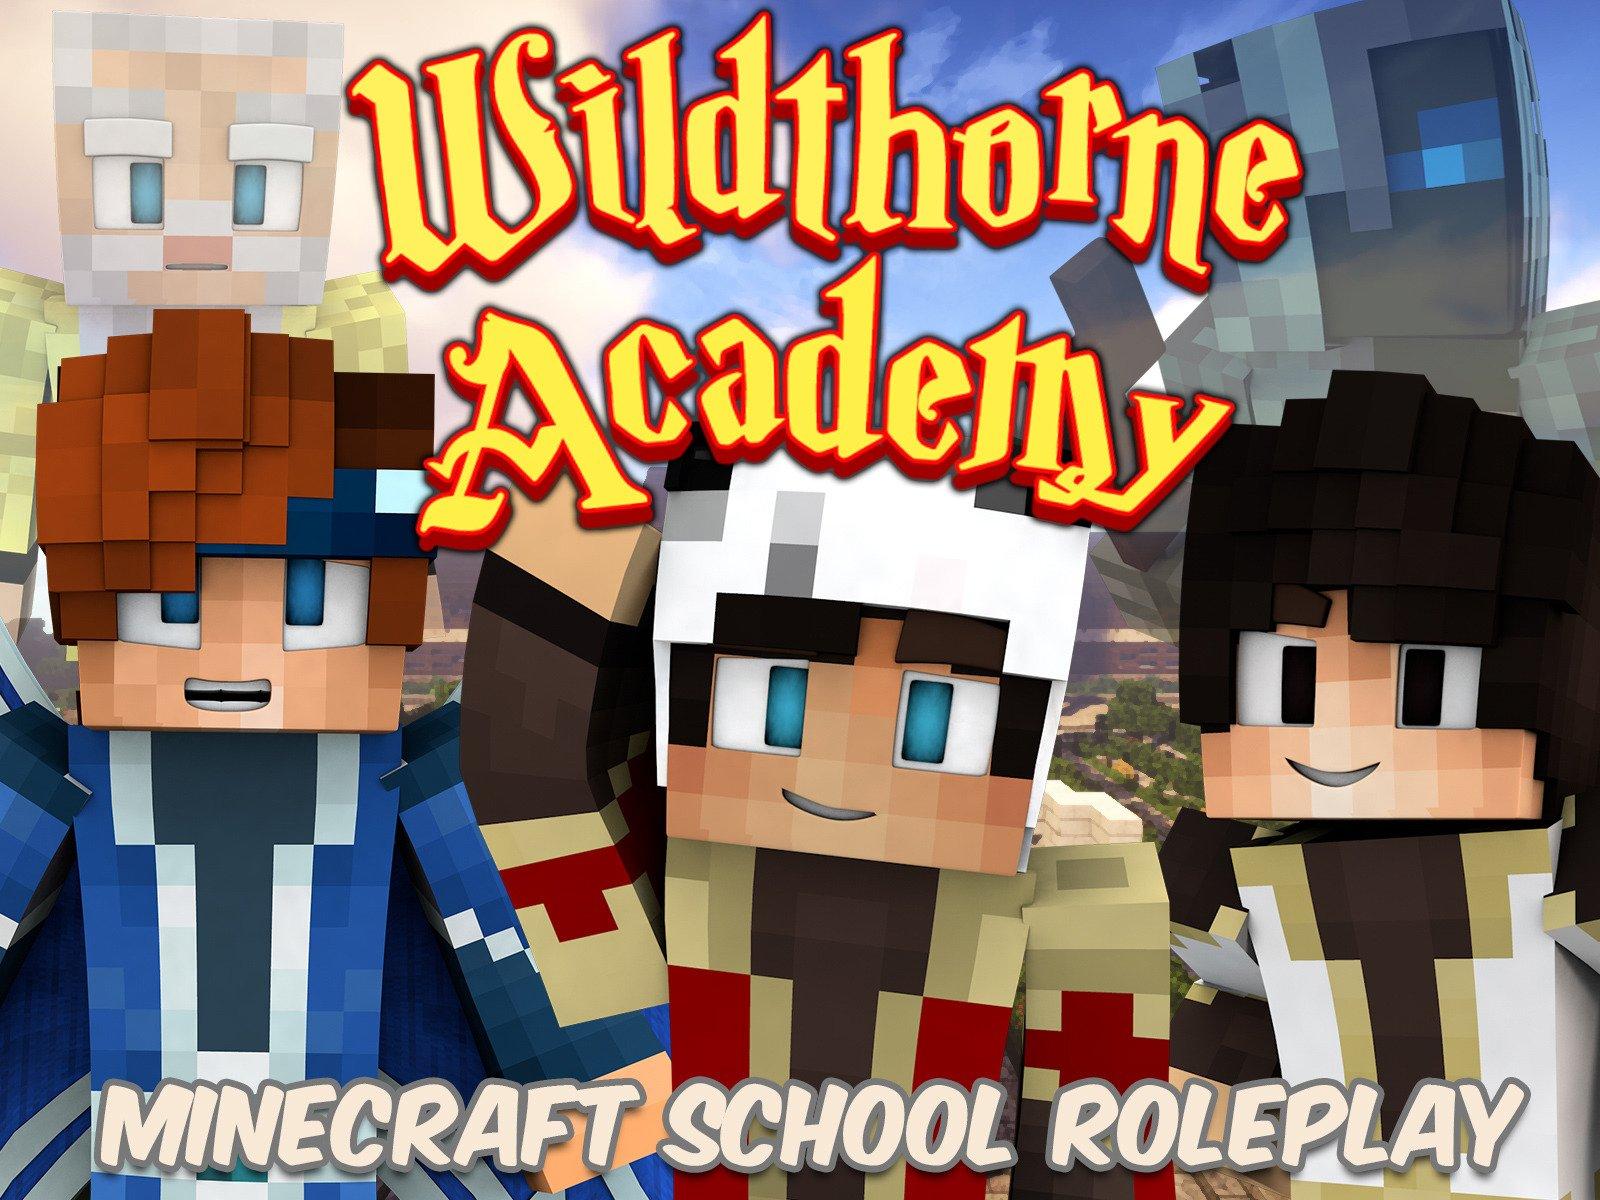 Wildthorne Academy (Minecraft School Roleplay) on Amazon Prime Video UK